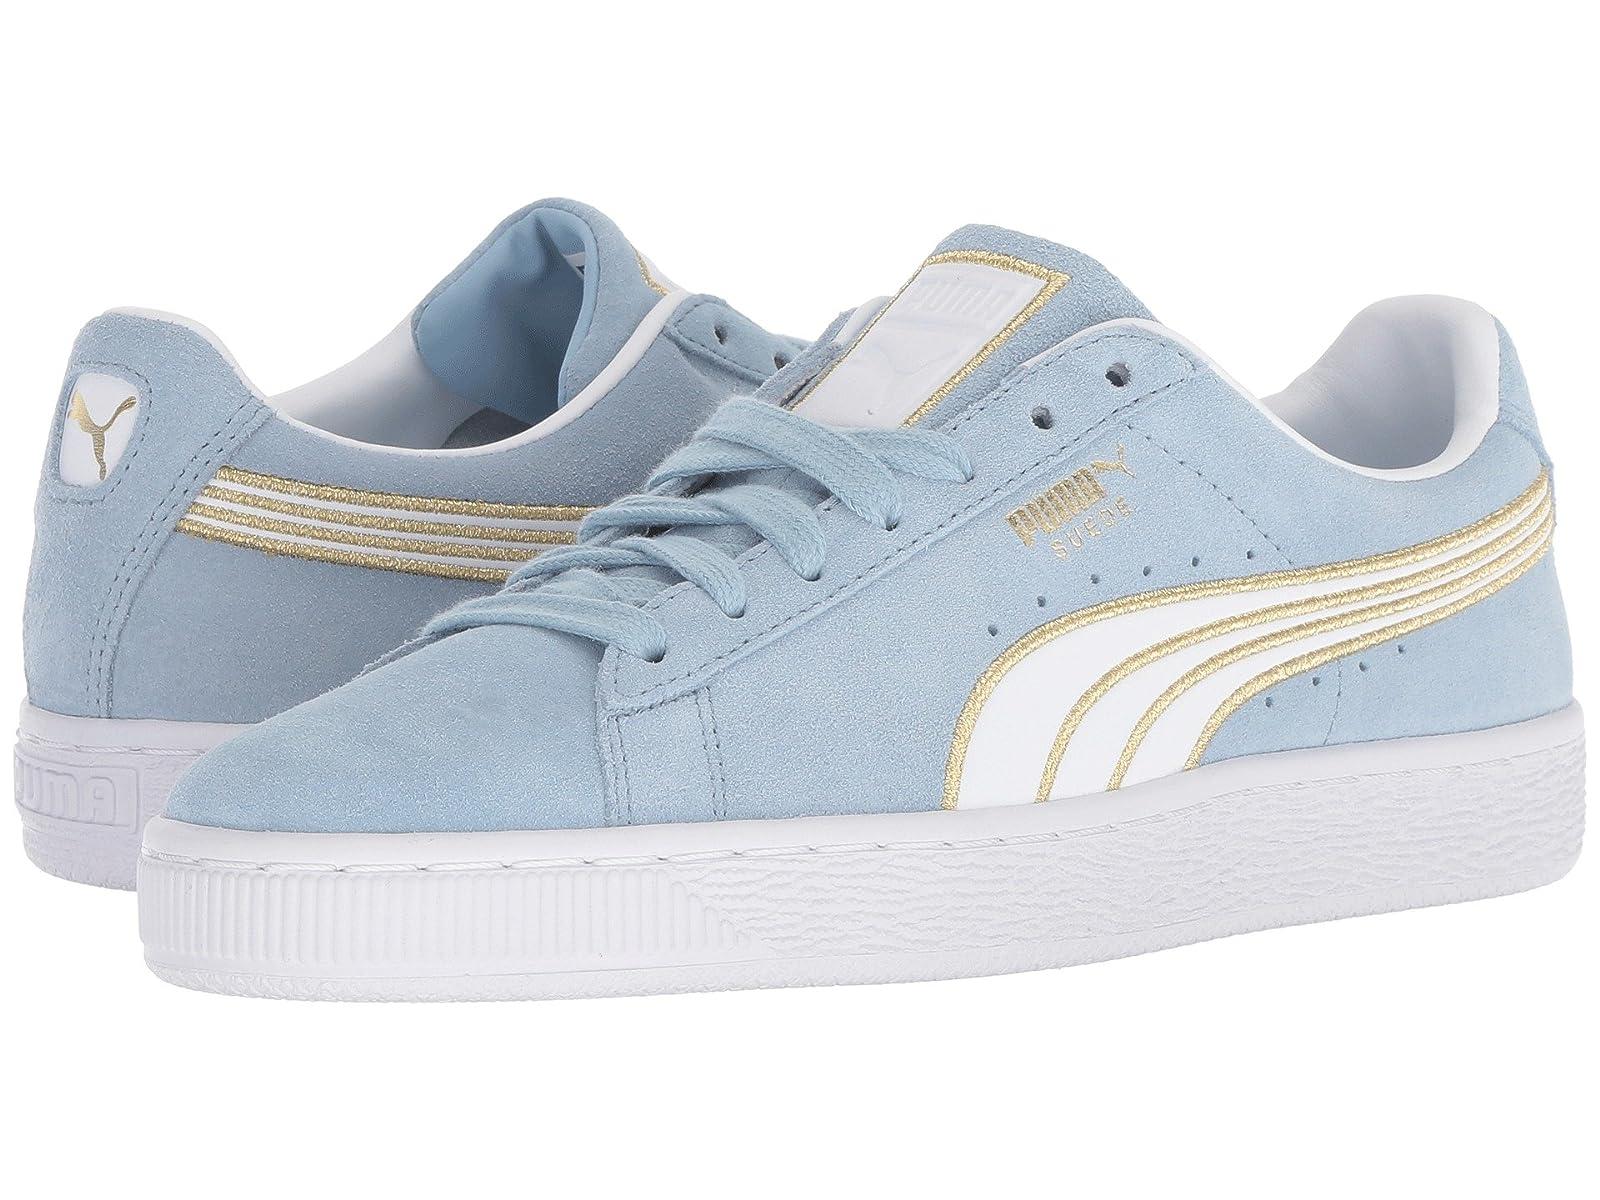 PUMA Suede VarsityAtmospheric grades have affordable shoes